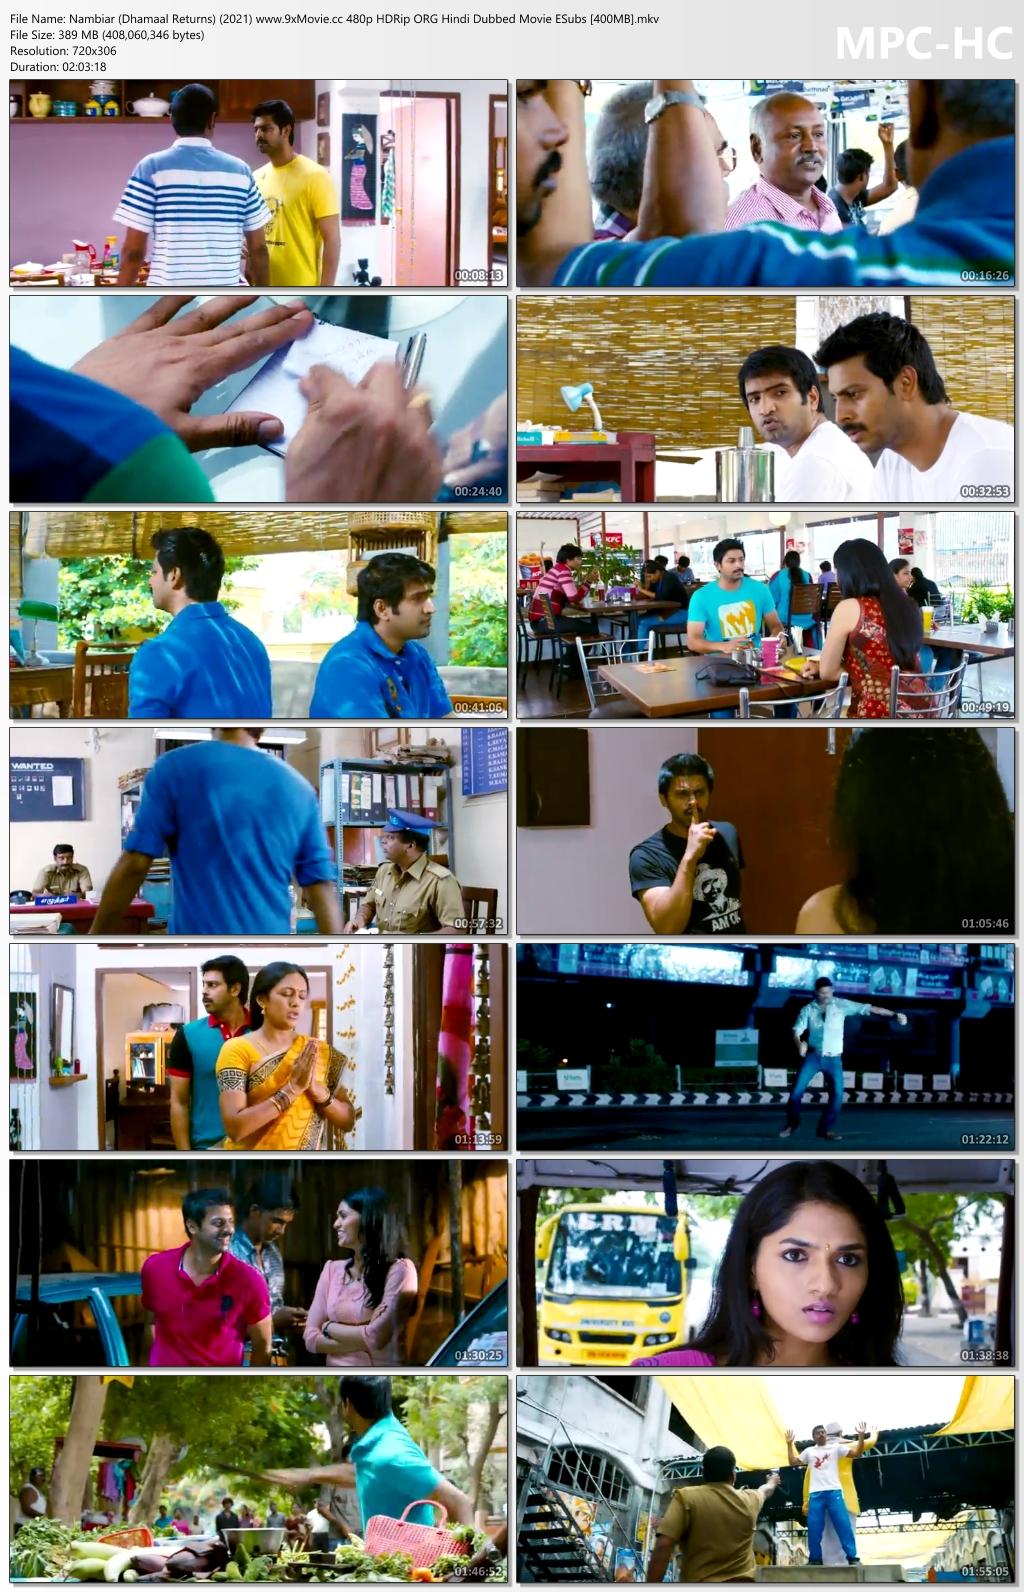 Nambiar-Dhamaal-Returns-2021-www-9x-Movie-cc-480p-HDRip-ORG-Hindi-Dubbed-Movie-ESubs-400-MB-mkv